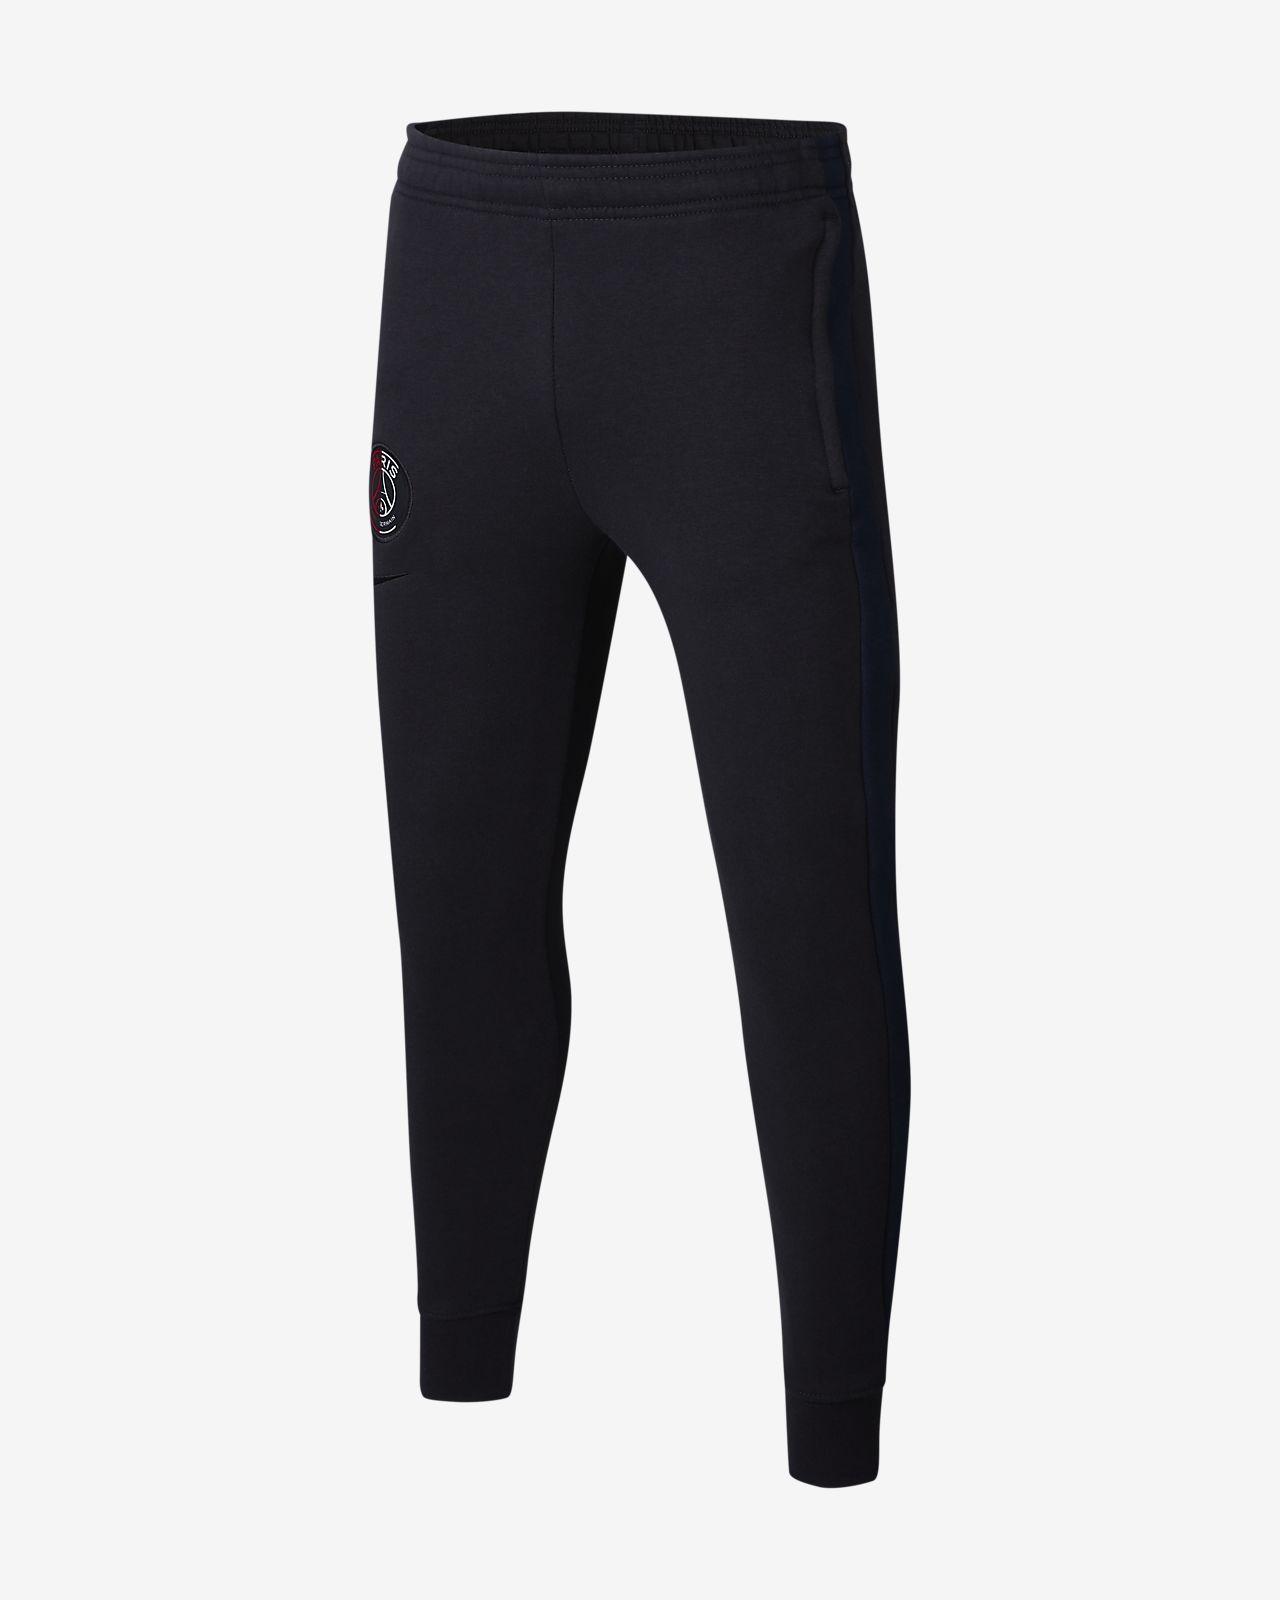 Paris Saint-Germain Pantalons de teixit Fleece - Nen/a